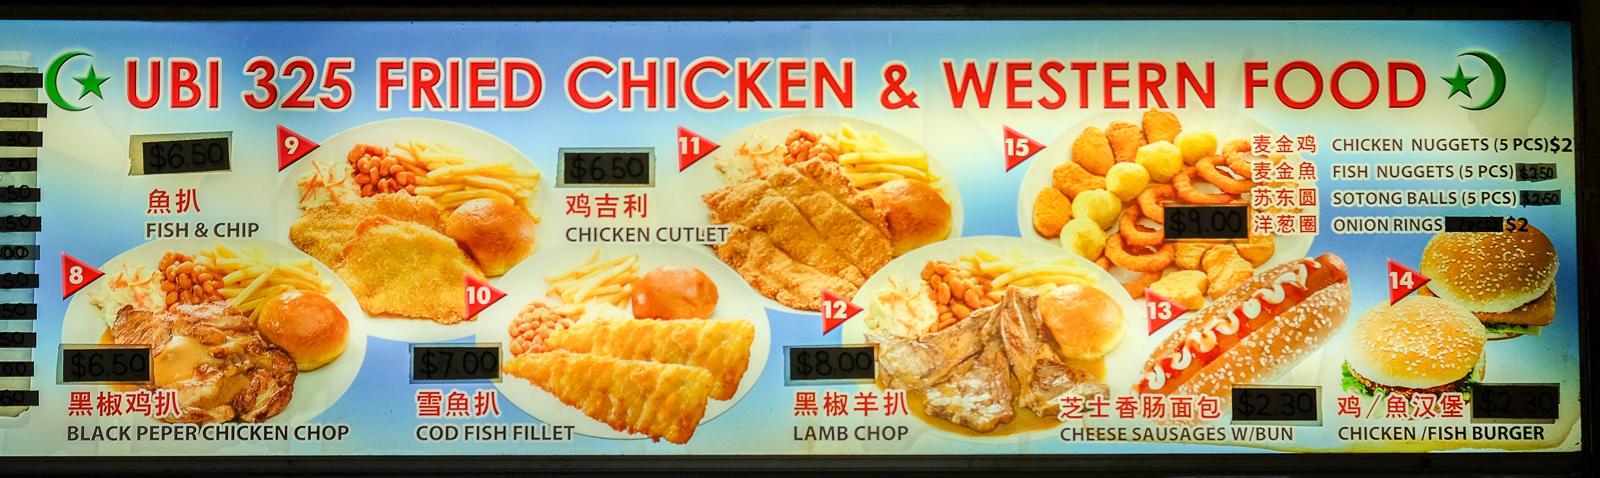 Ubi325friedchicken&westernfood1